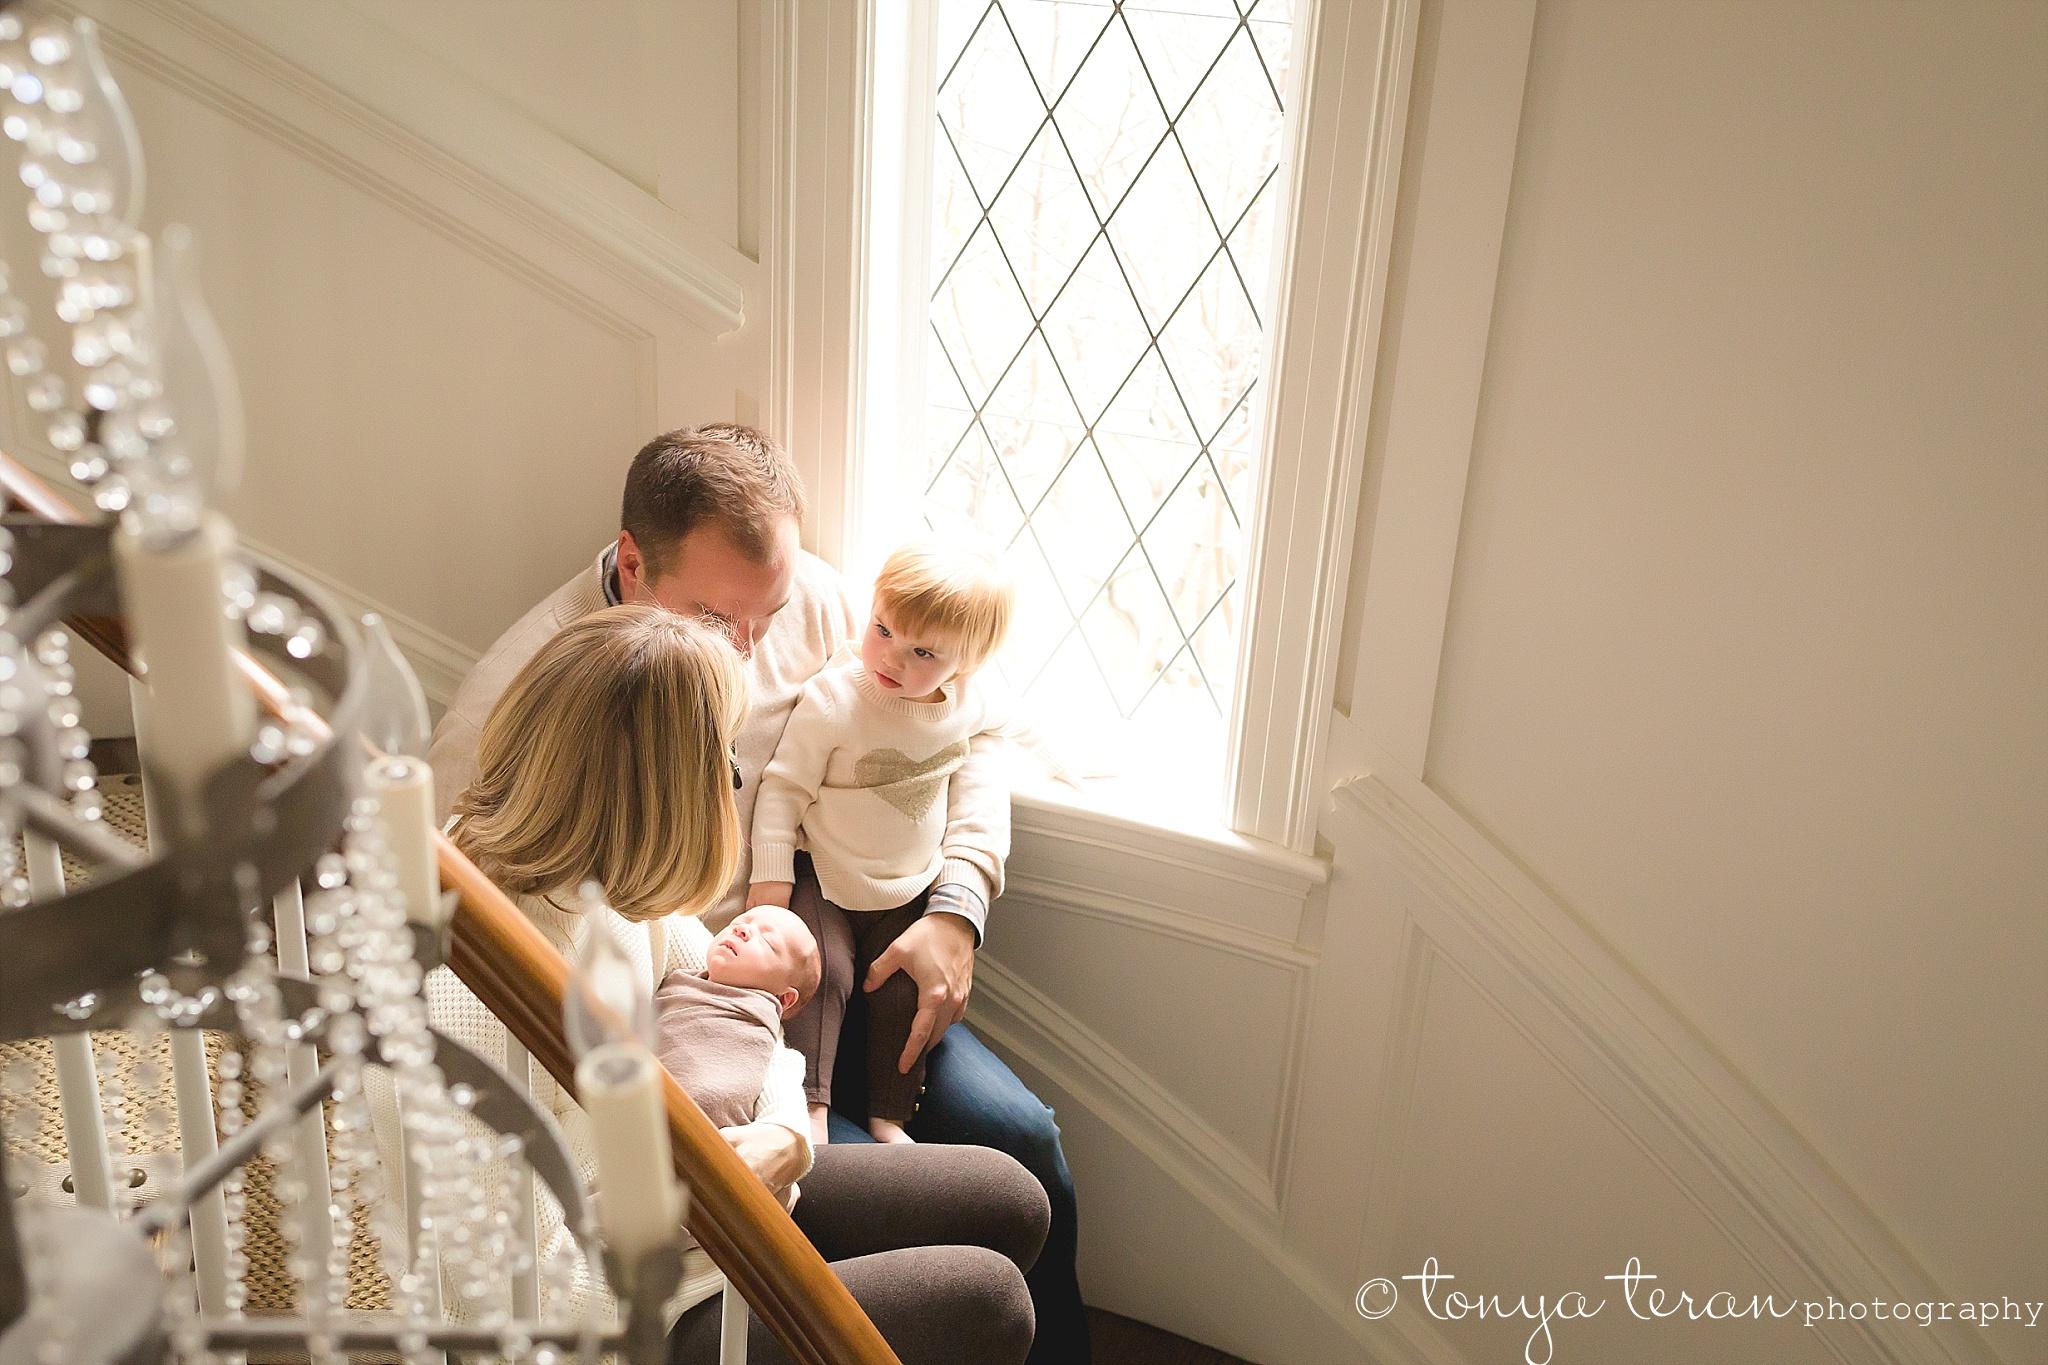 Family Newborn Photo Session   Tonya Teran Photography, Washington, DC Newborn, Baby, and Family Photographer